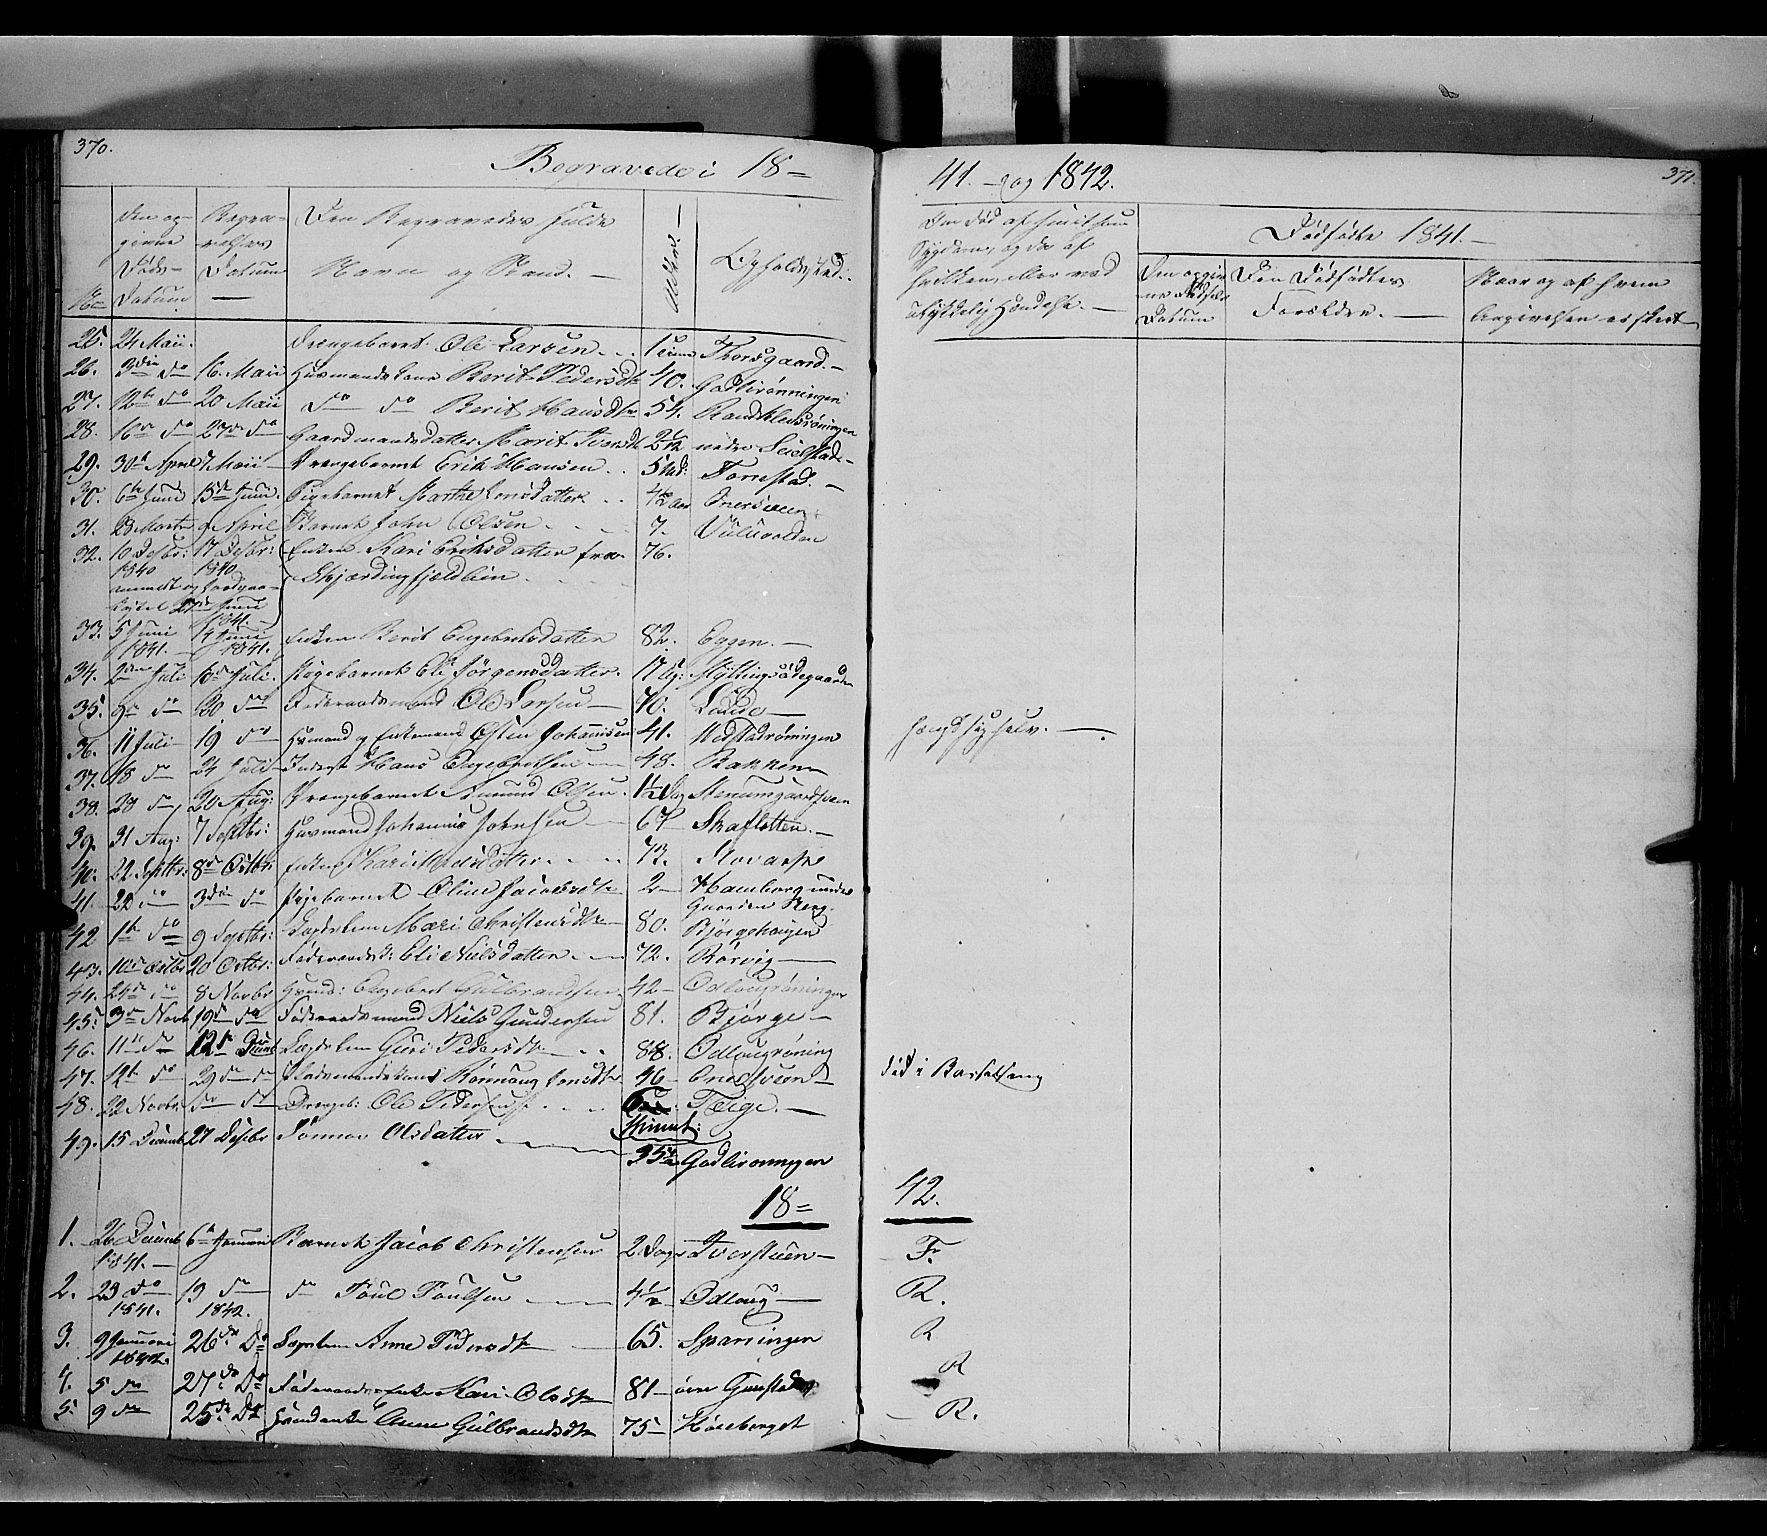 SAH, Ringebu prestekontor, Ministerialbok nr. 5, 1839-1848, s. 370-371